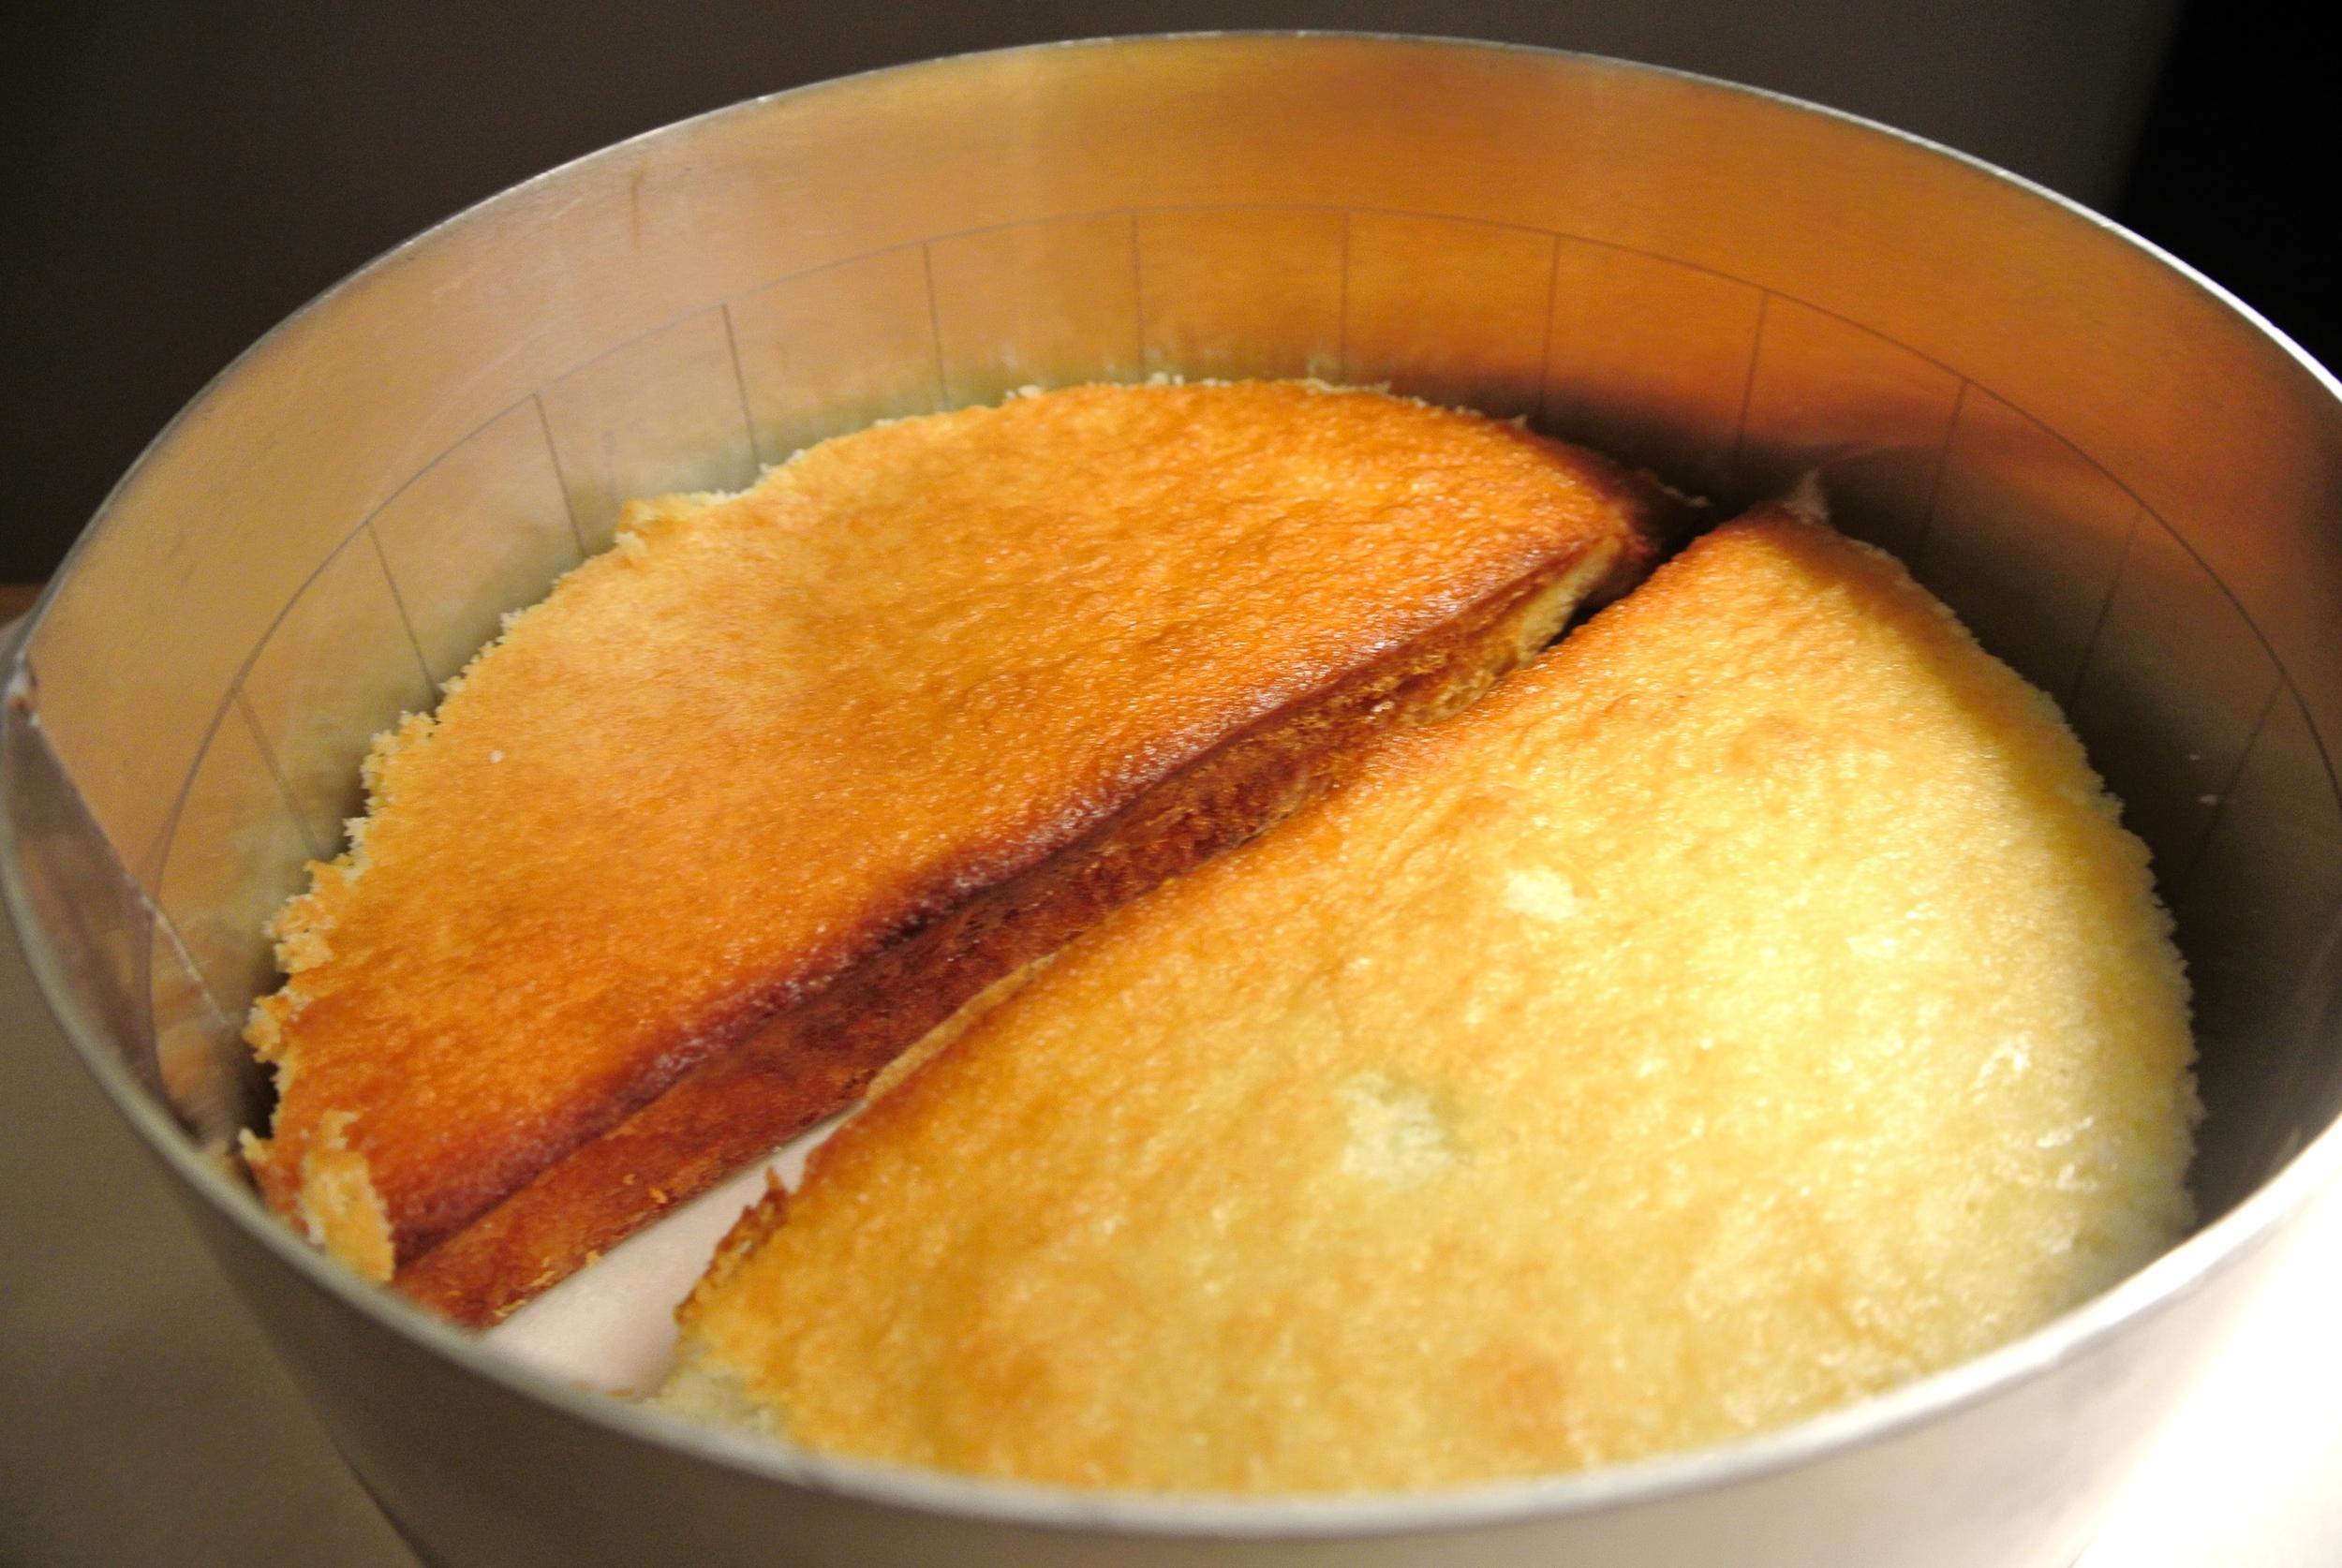 Cake Layer One